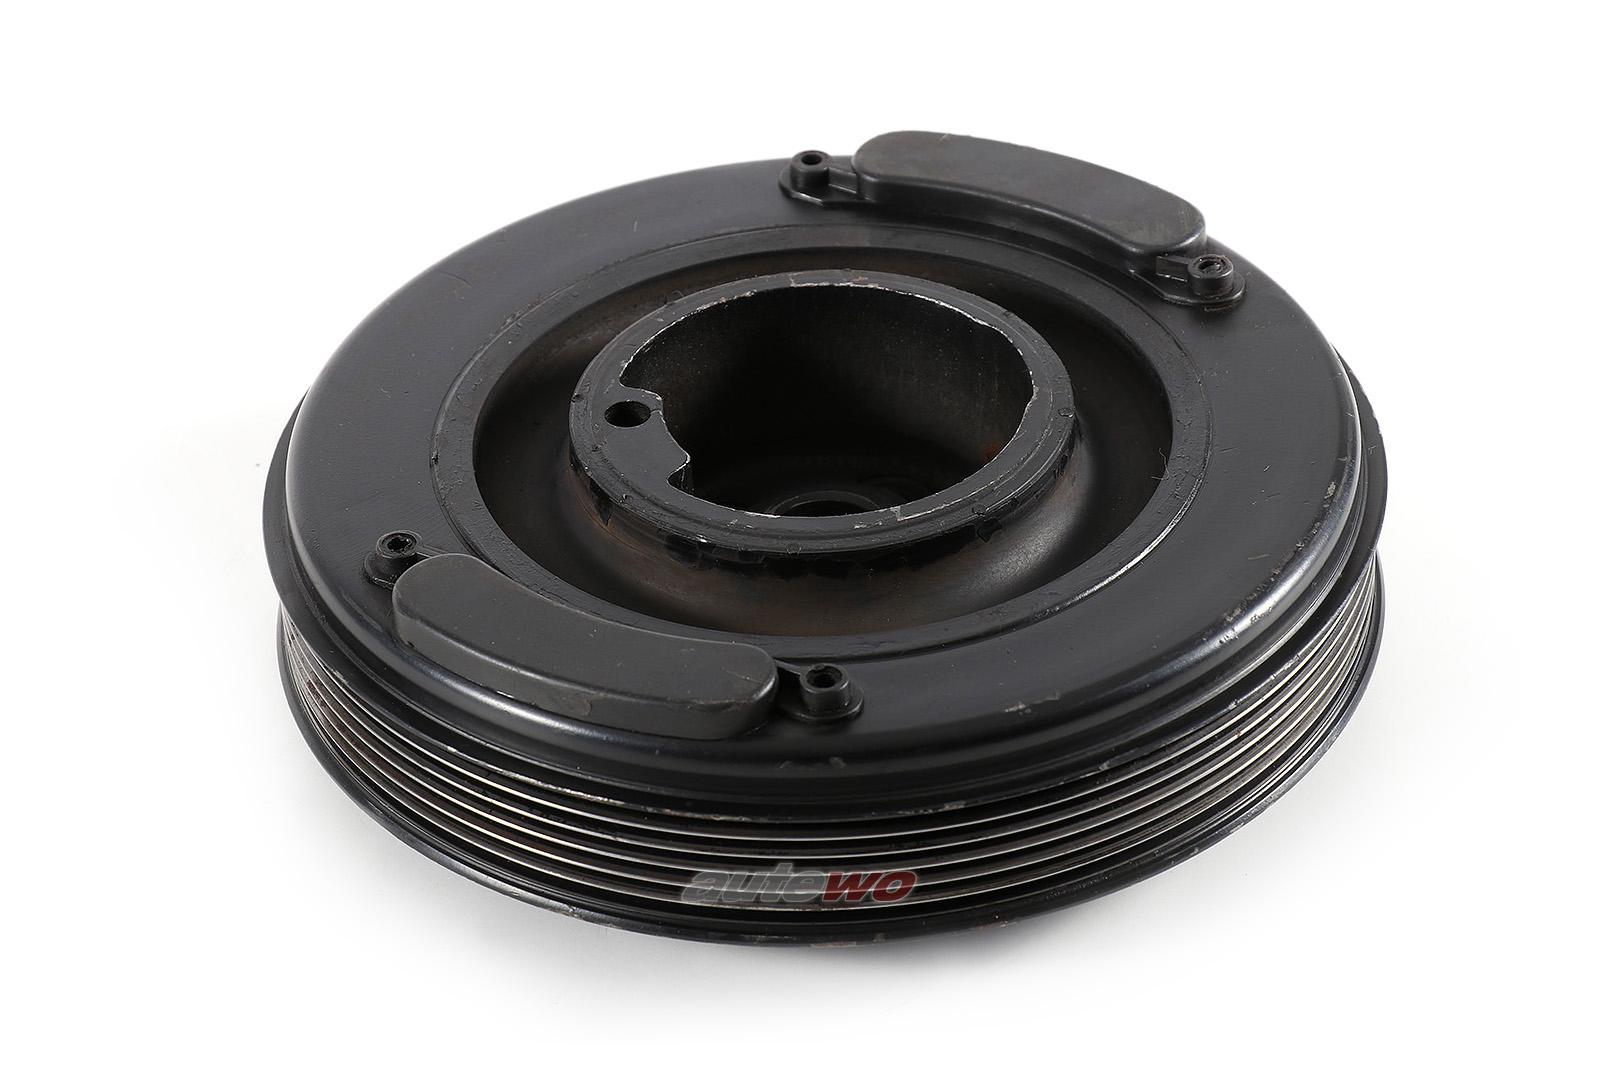 Febi 26834 Audi/VW 100/A6 C4 2.5l TDI Schwingungsdämpfer entspricht 074105251AC